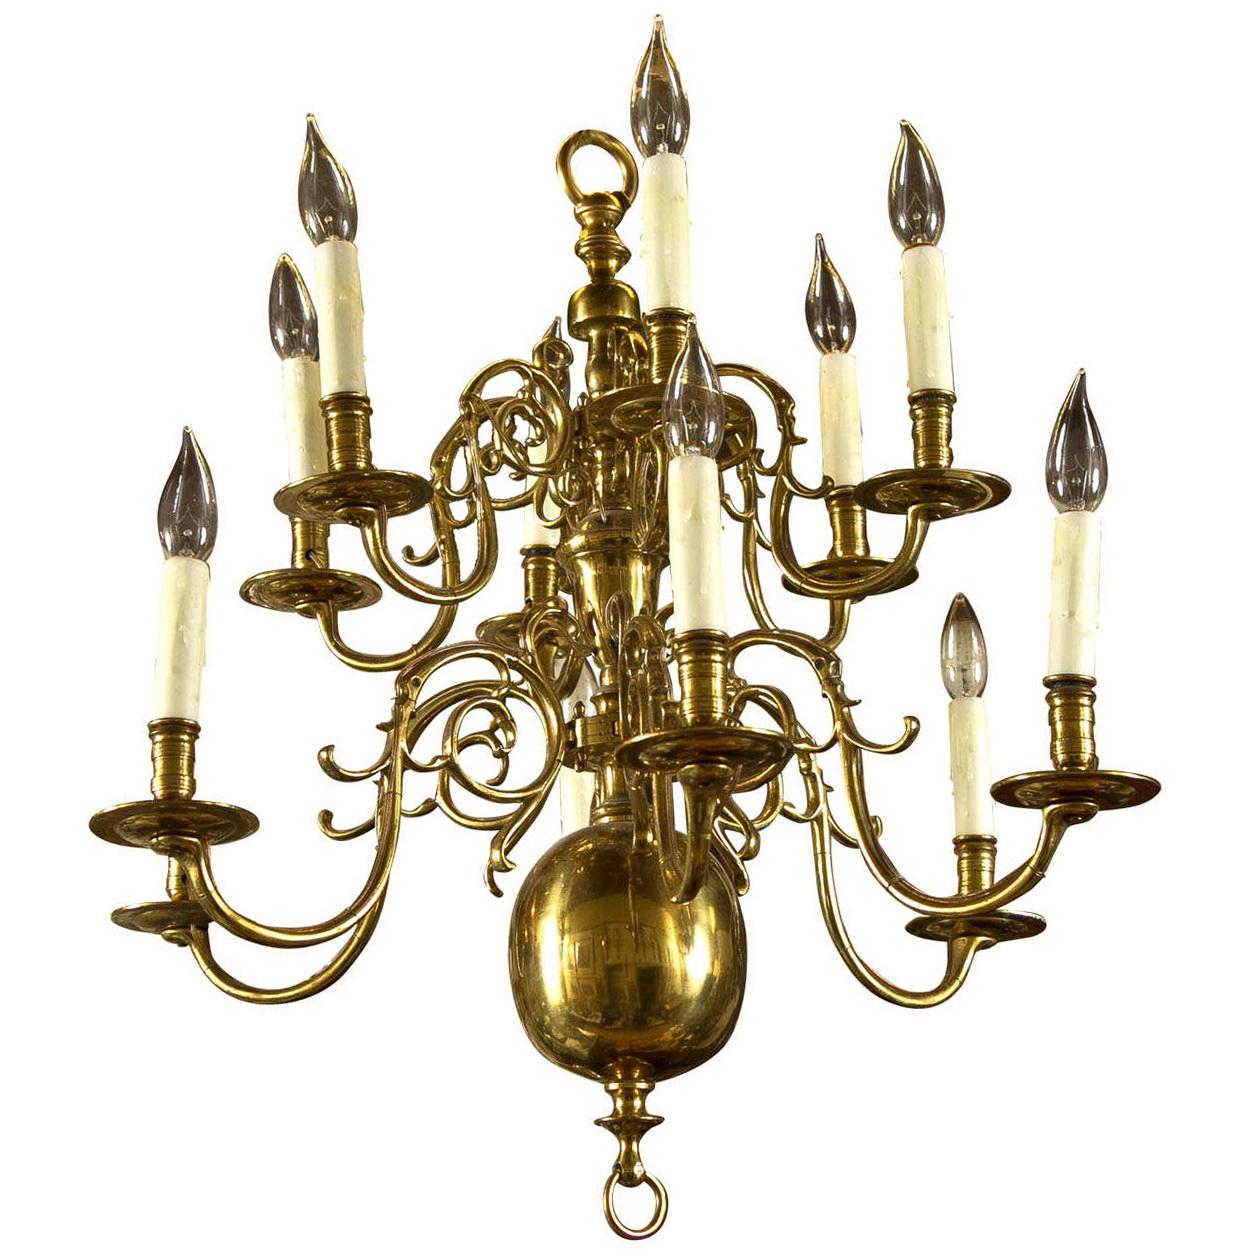 12 Light Brass Chandelier